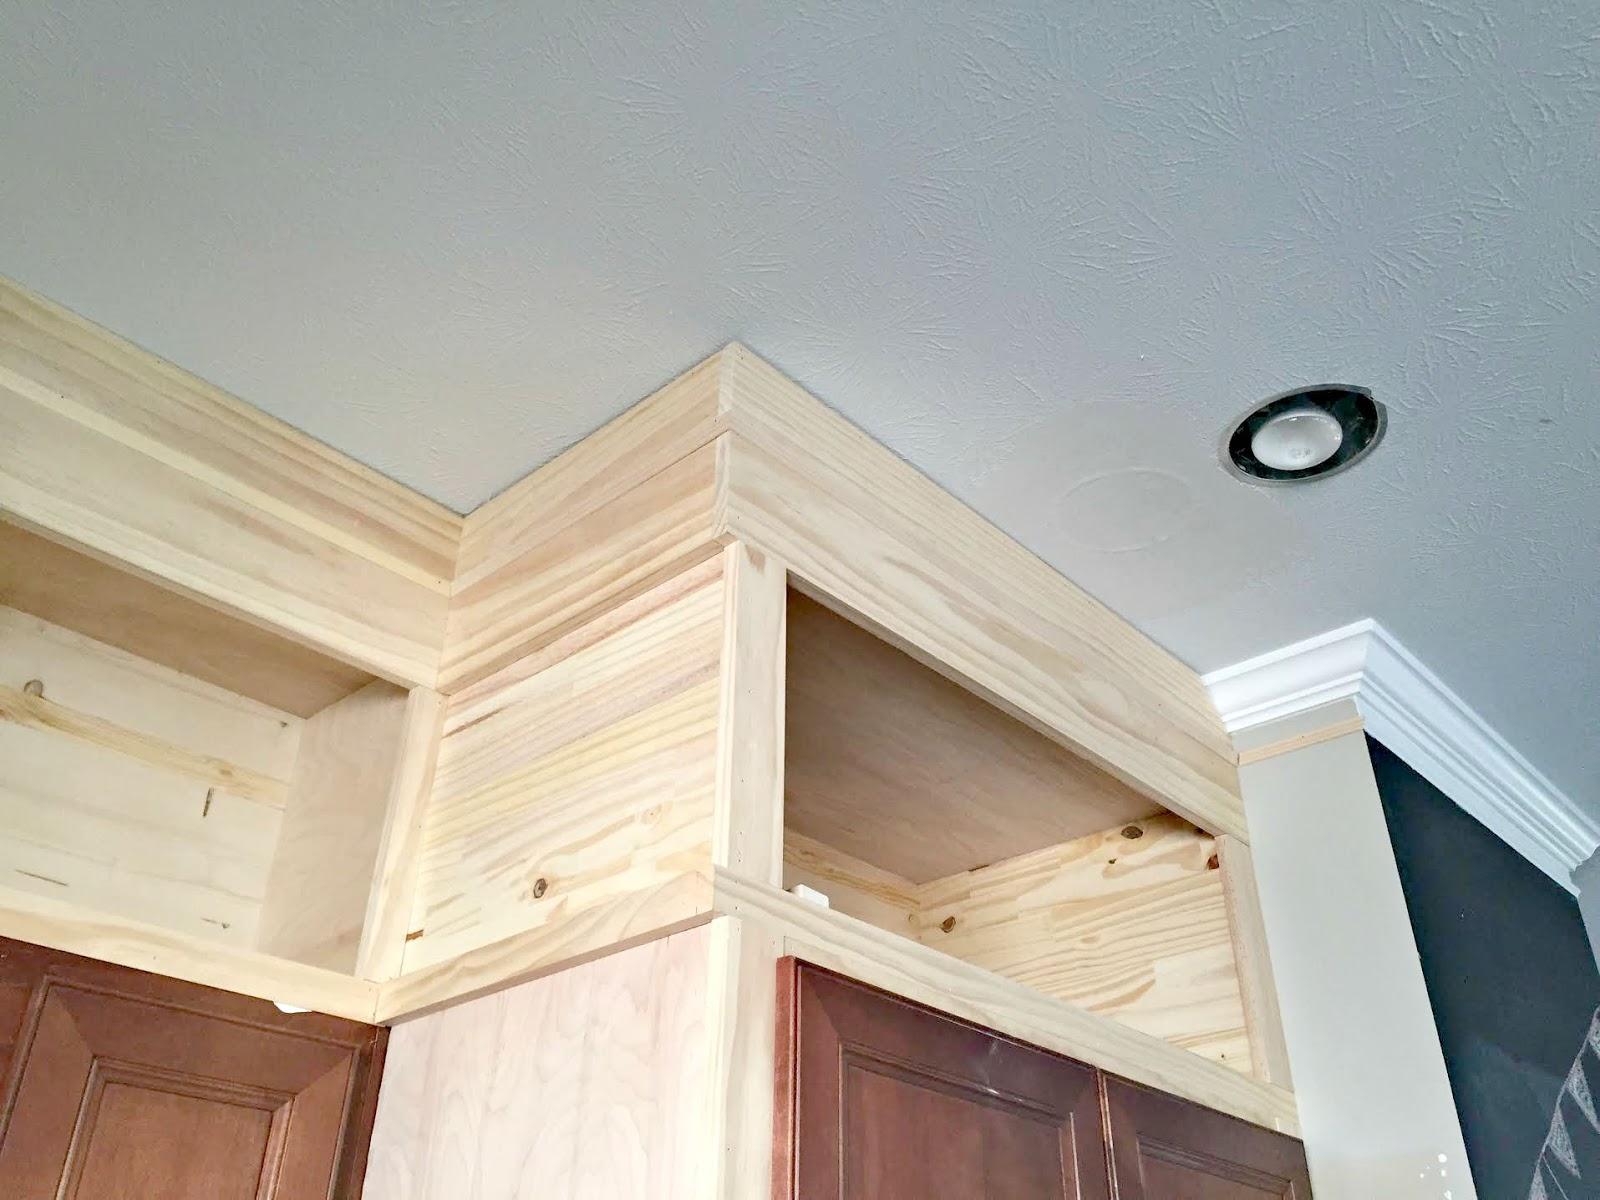 DIY enclosing fridge with cabinets